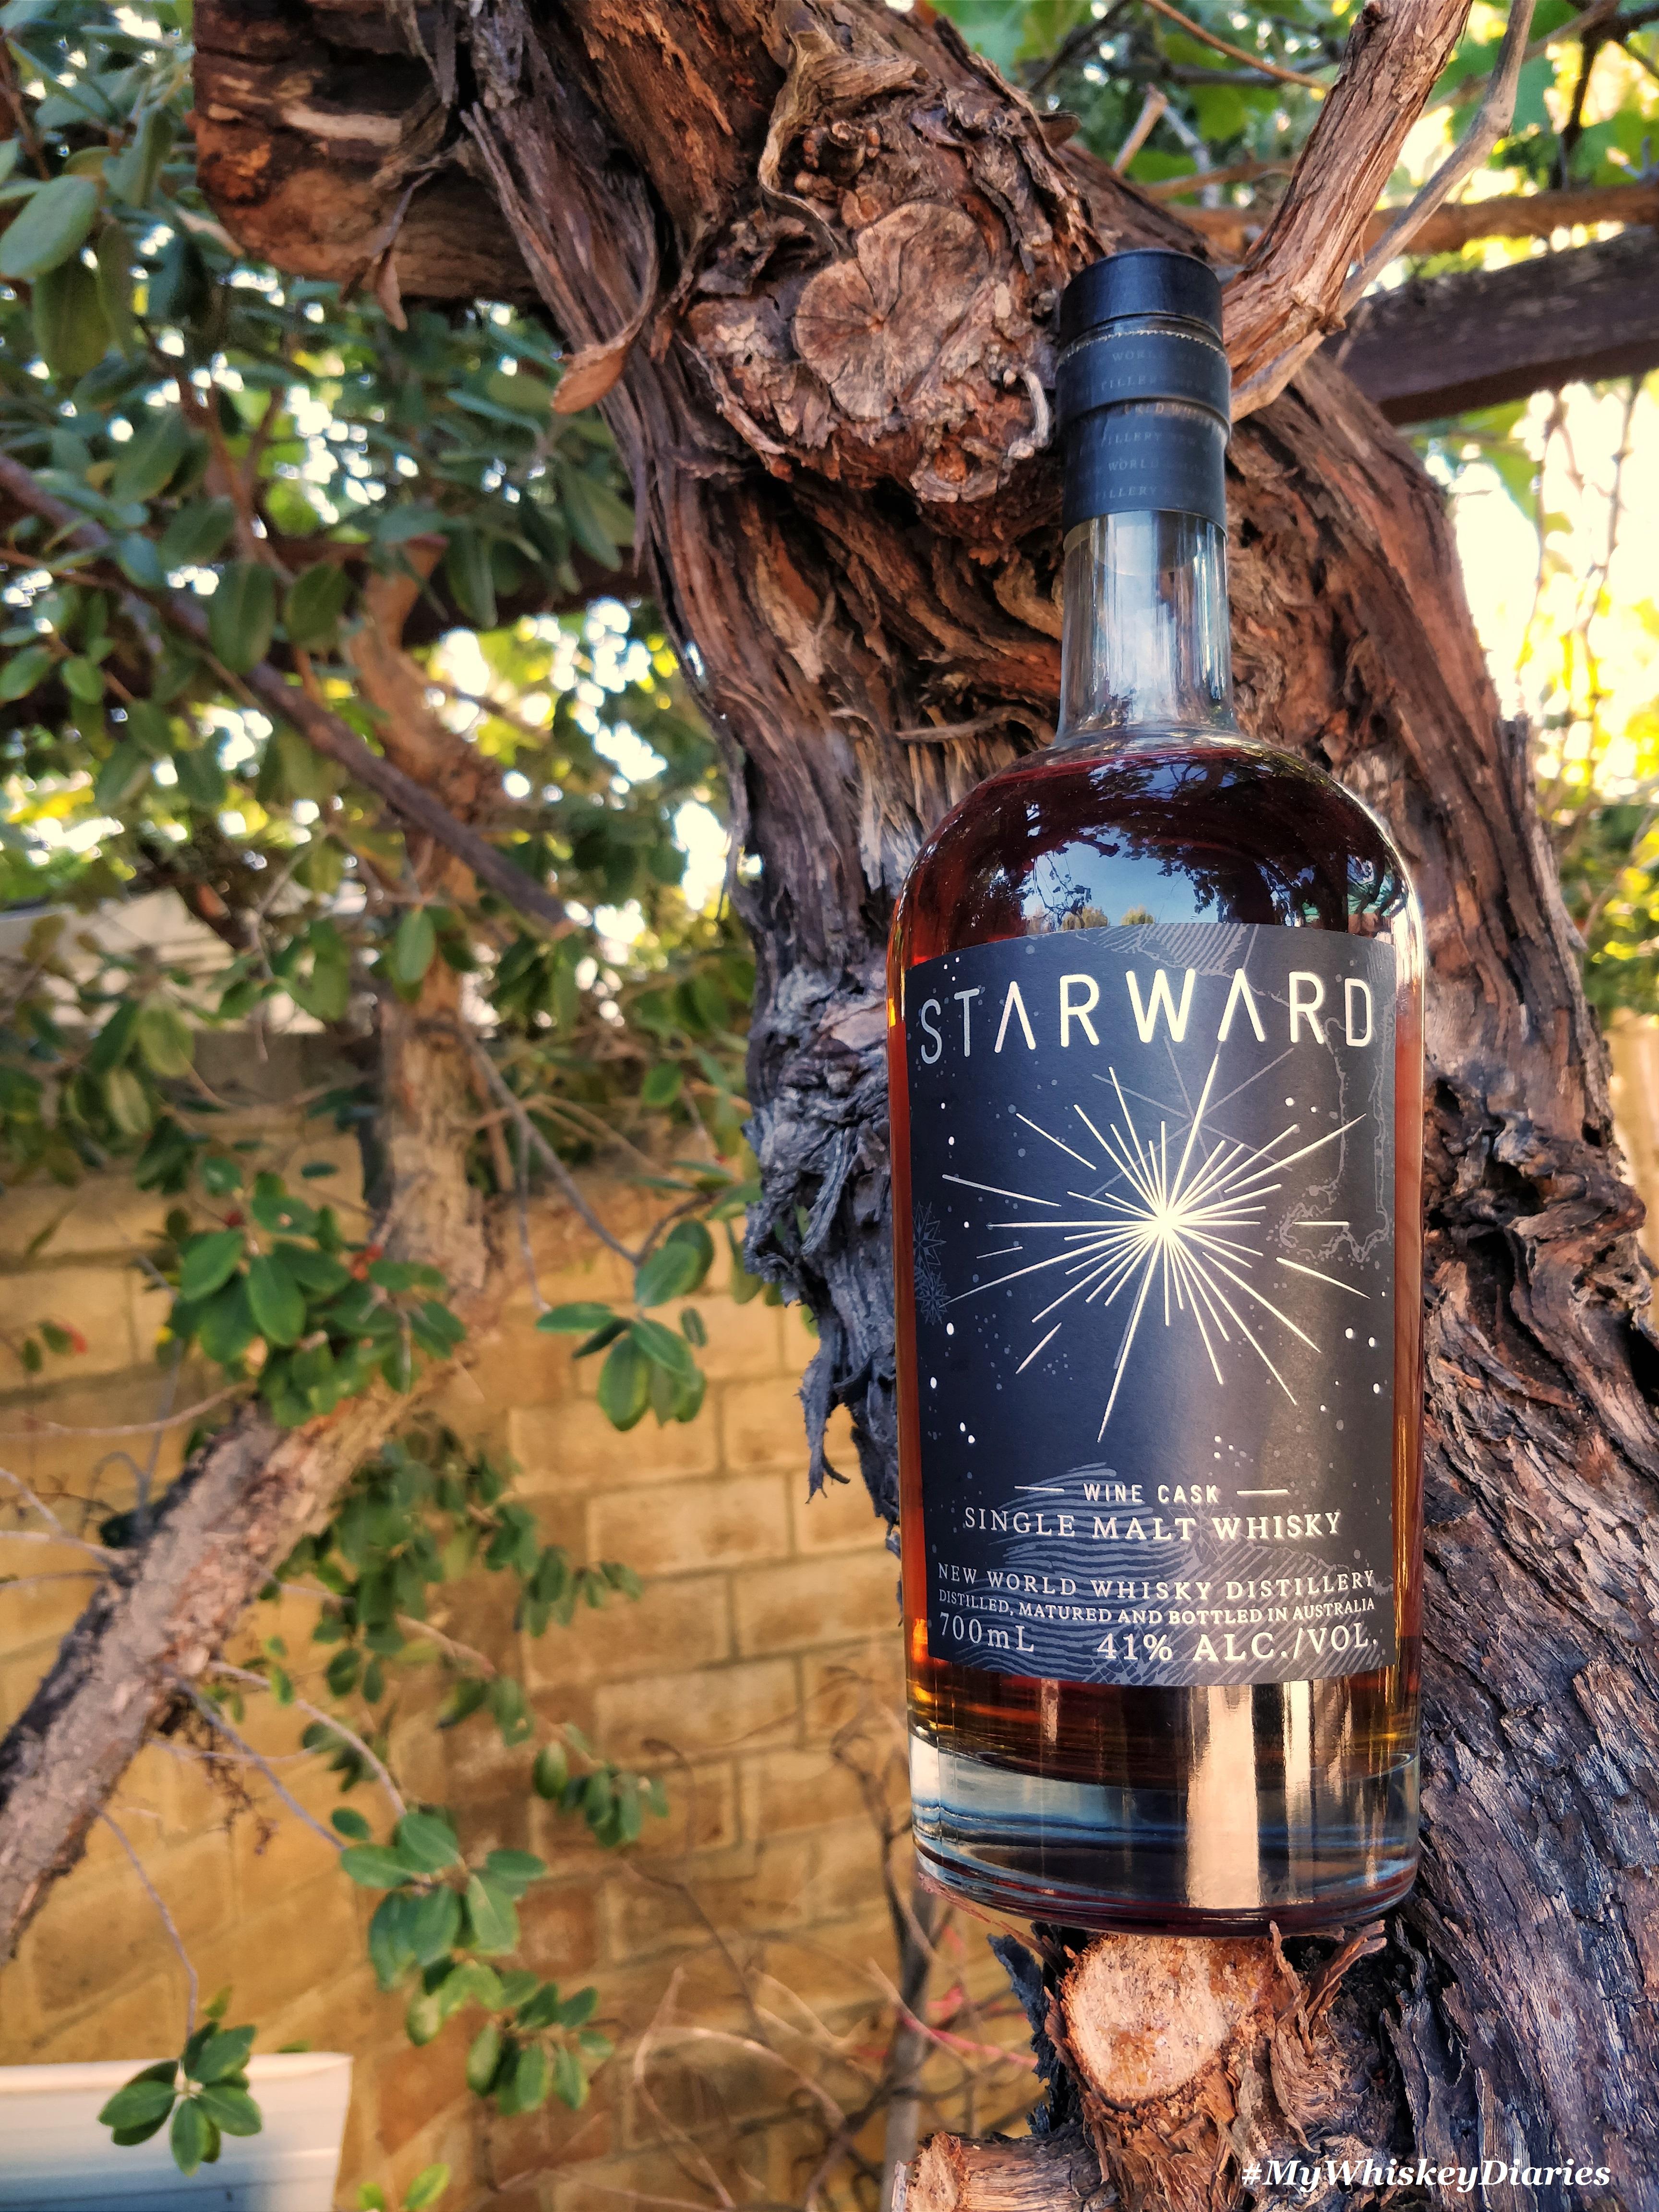 Review Starward Wine Cask Single Malt Whisky Uisce Beatha My